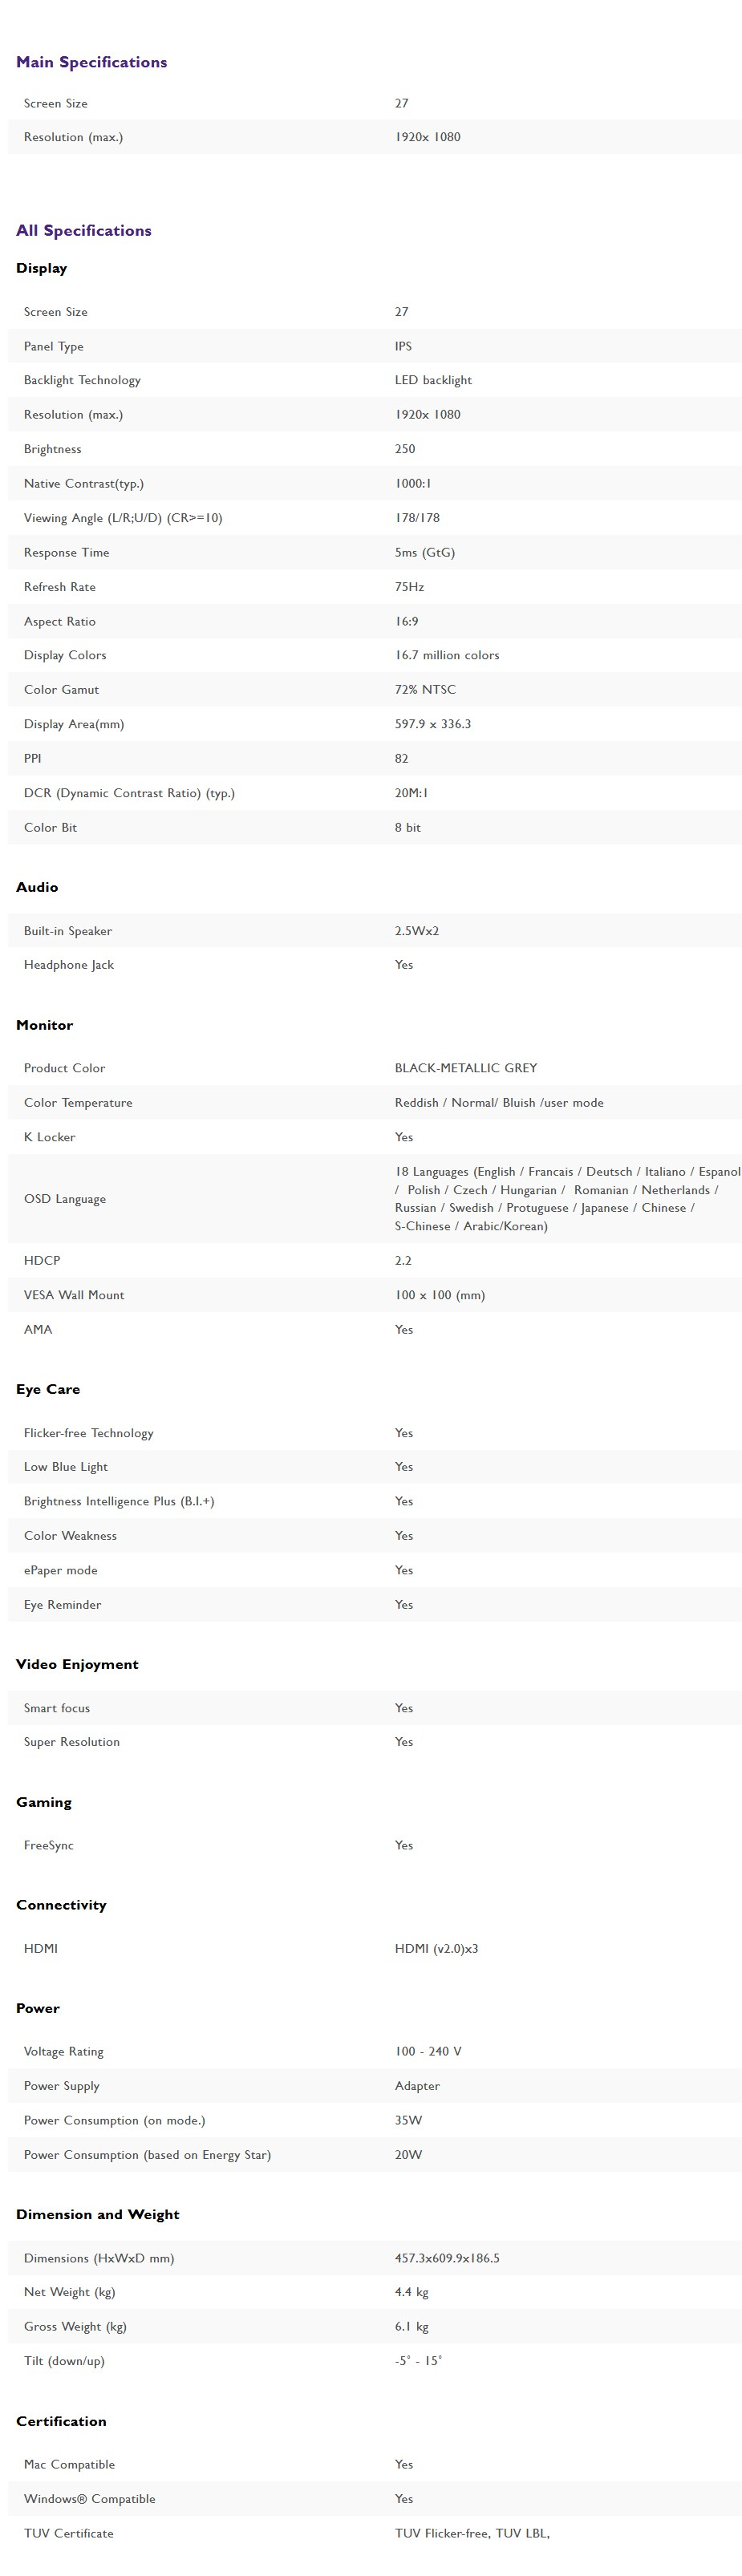 benq-ew2780-27-75hz-full-hd-hdr-eyecare-ips-monitor-ac35437-9.jpg